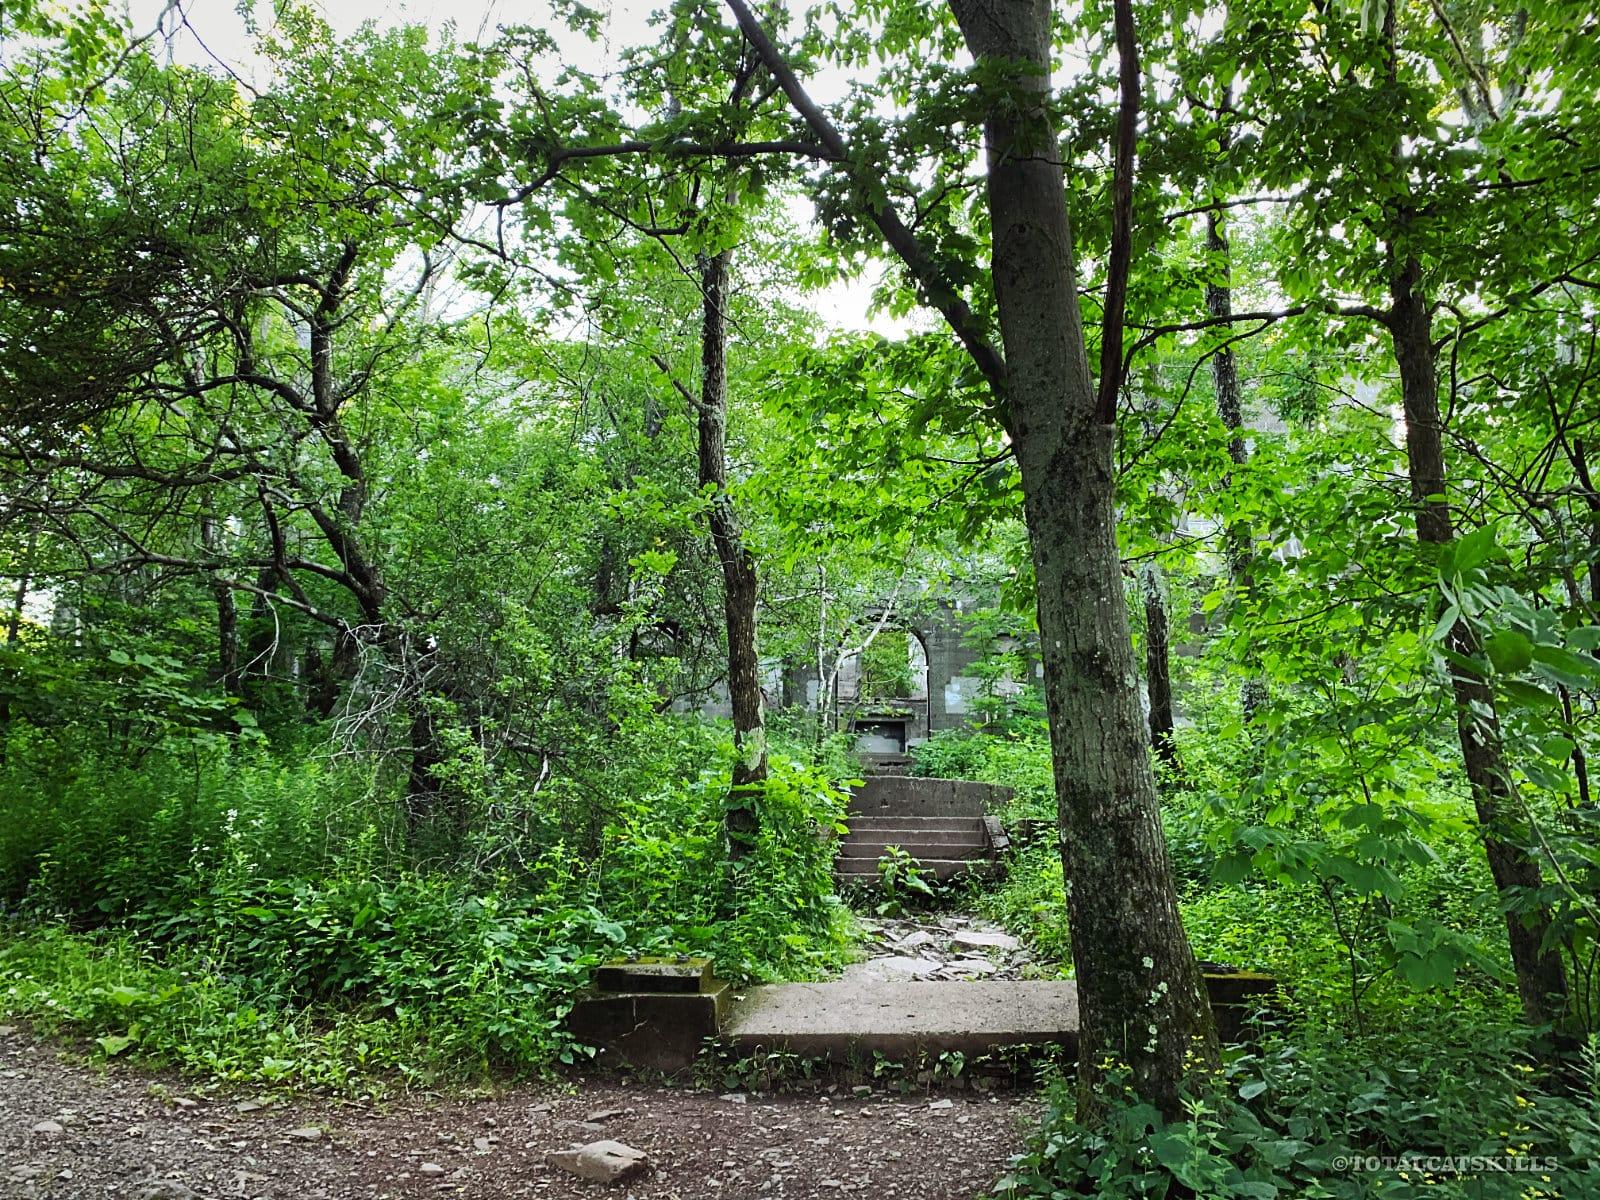 entrance to overlook mountainn house ruins, overlook mountain trail